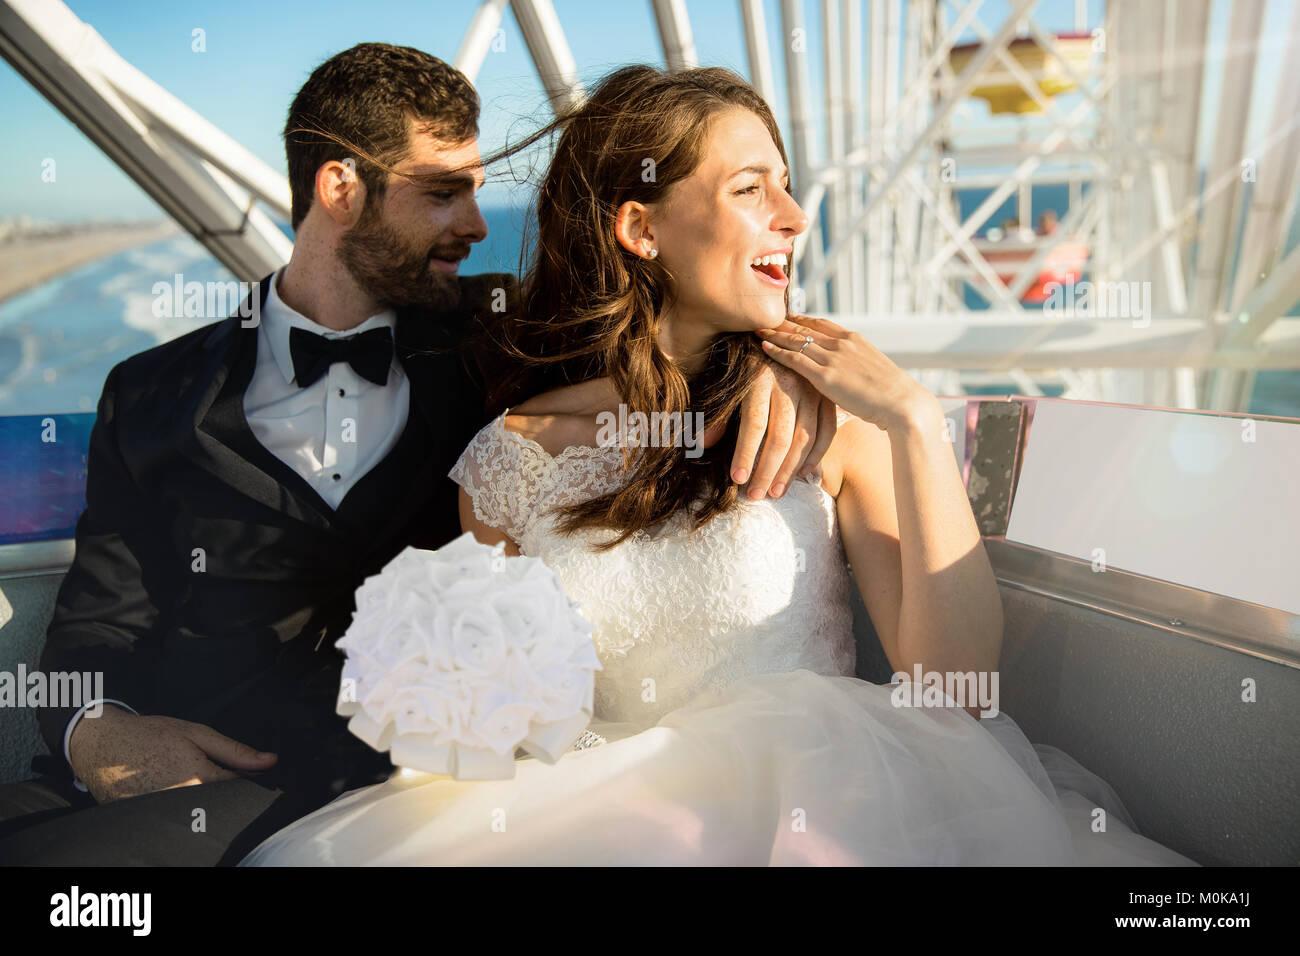 Theme Park Ride Stockfotos & Theme Park Ride Bilder - Alamy